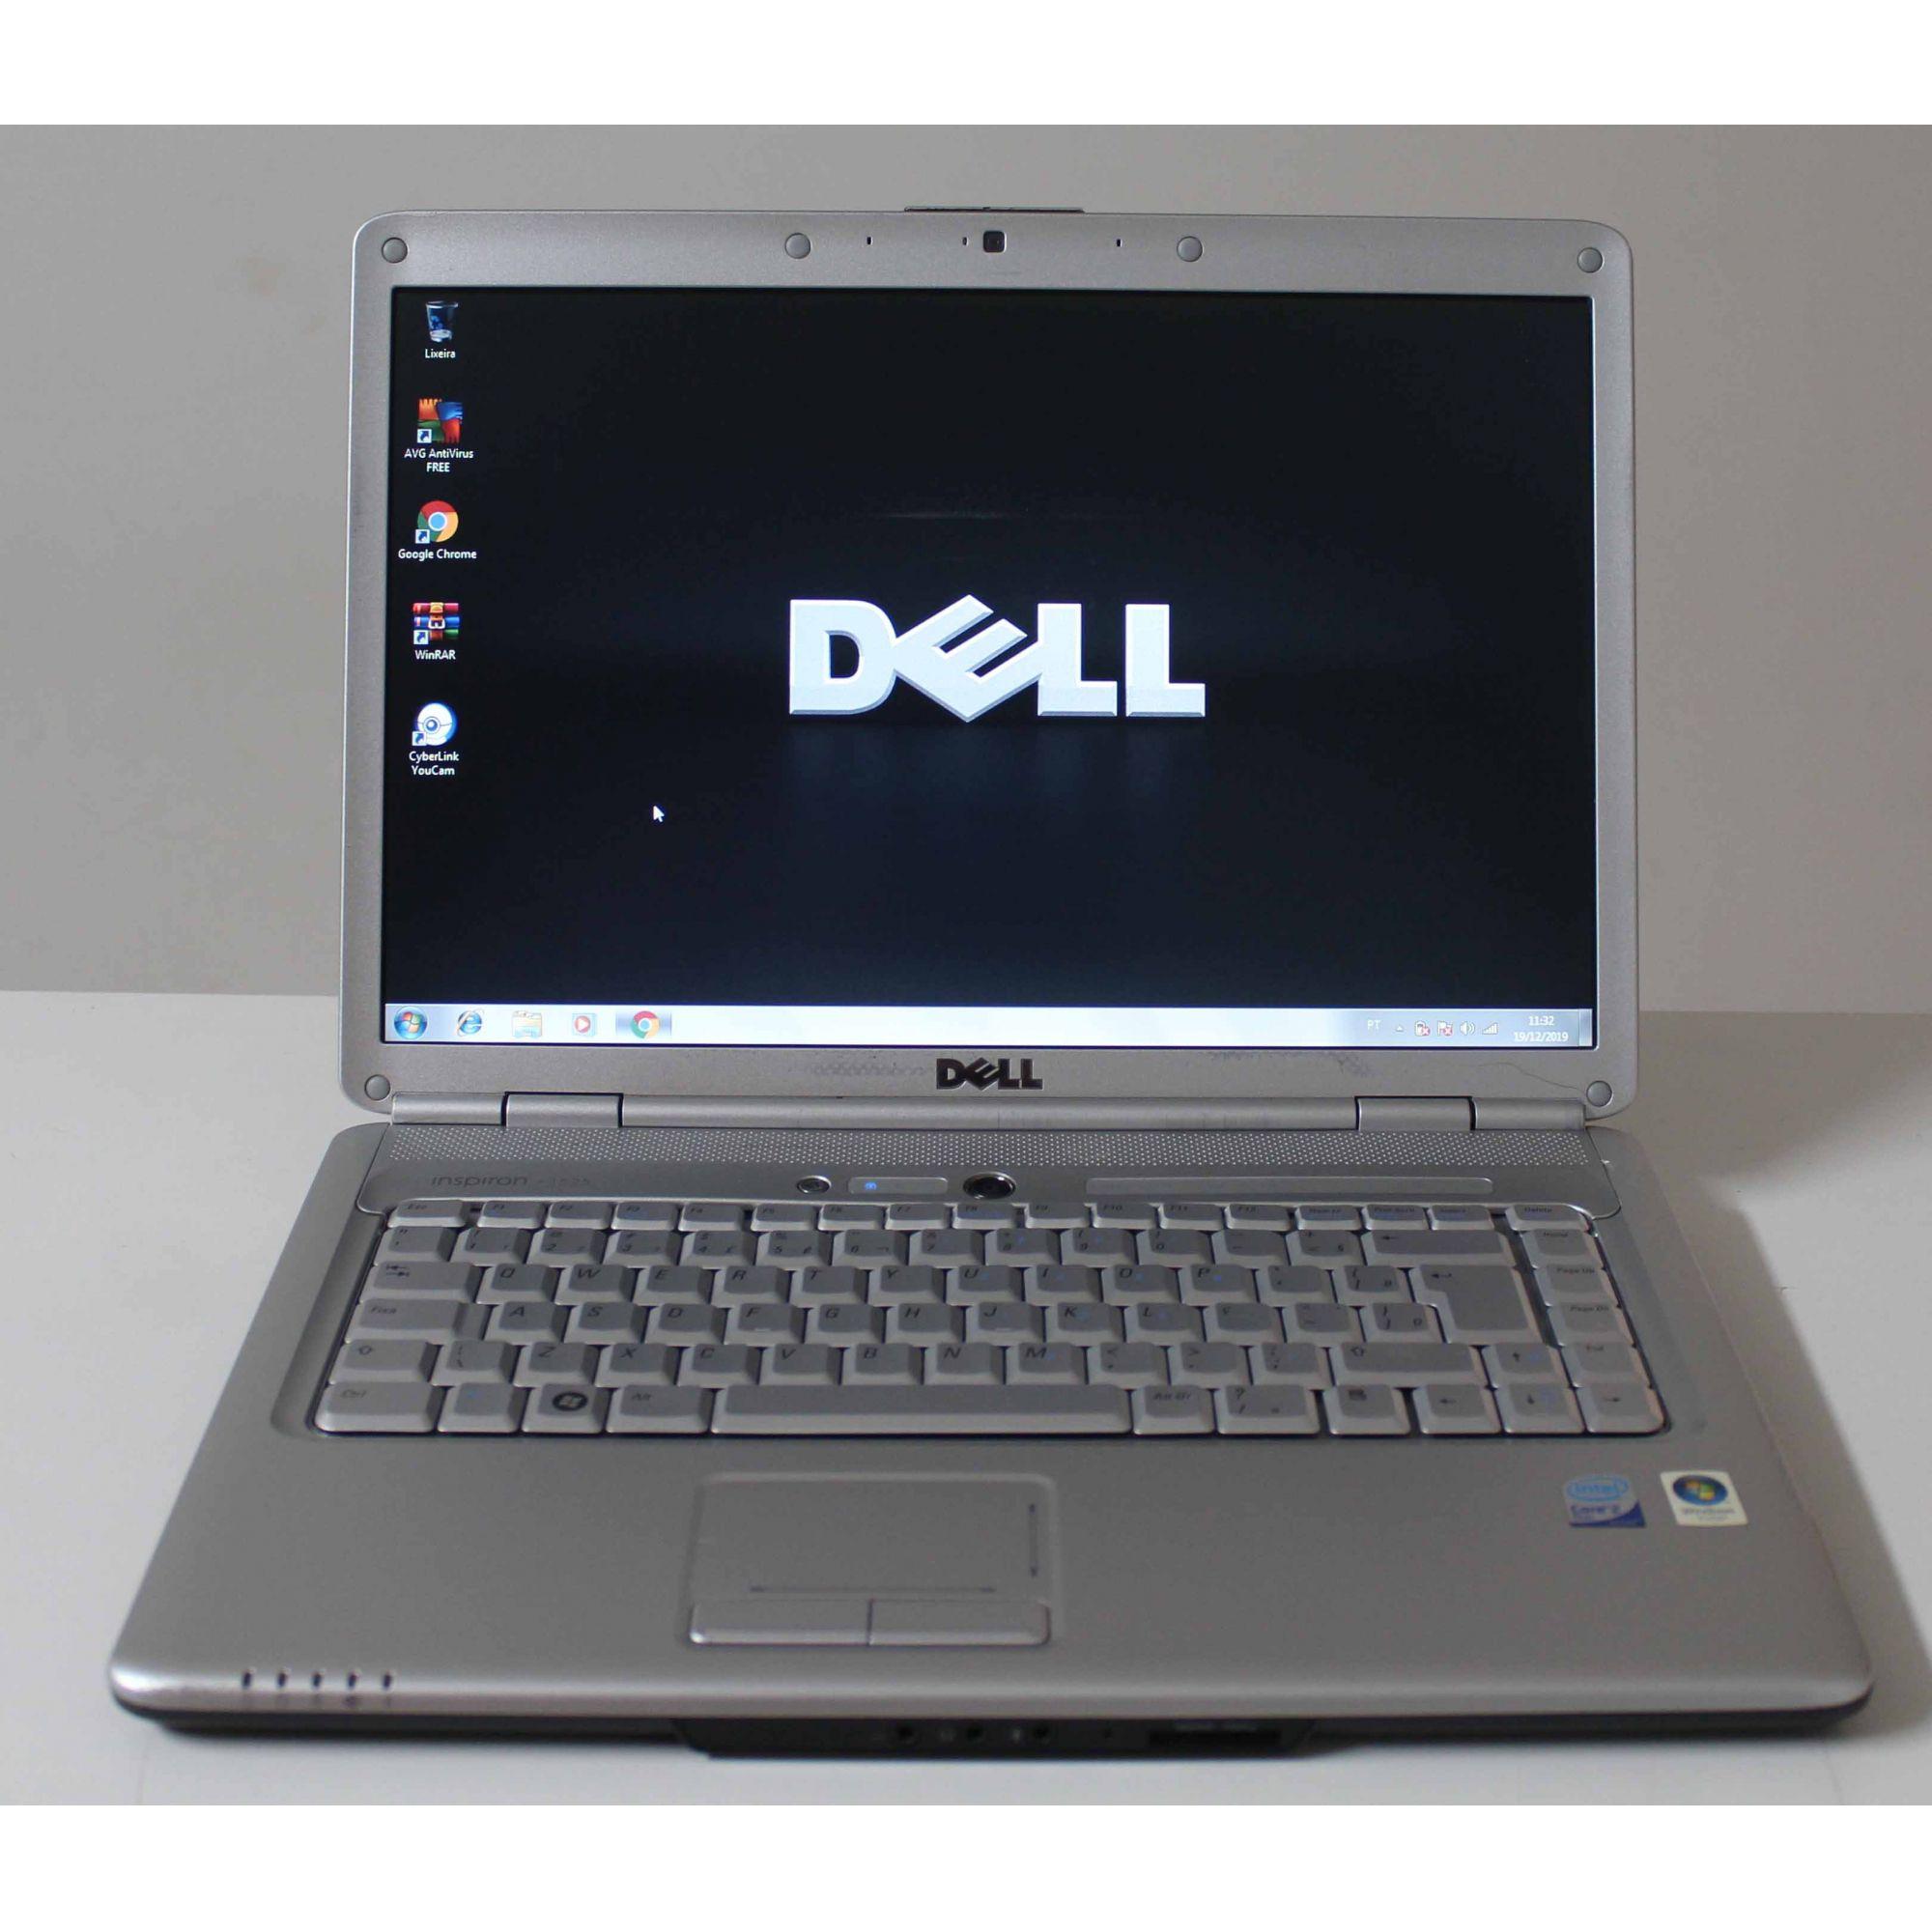 Notebook Dell Inspirion 1525 (Usado)